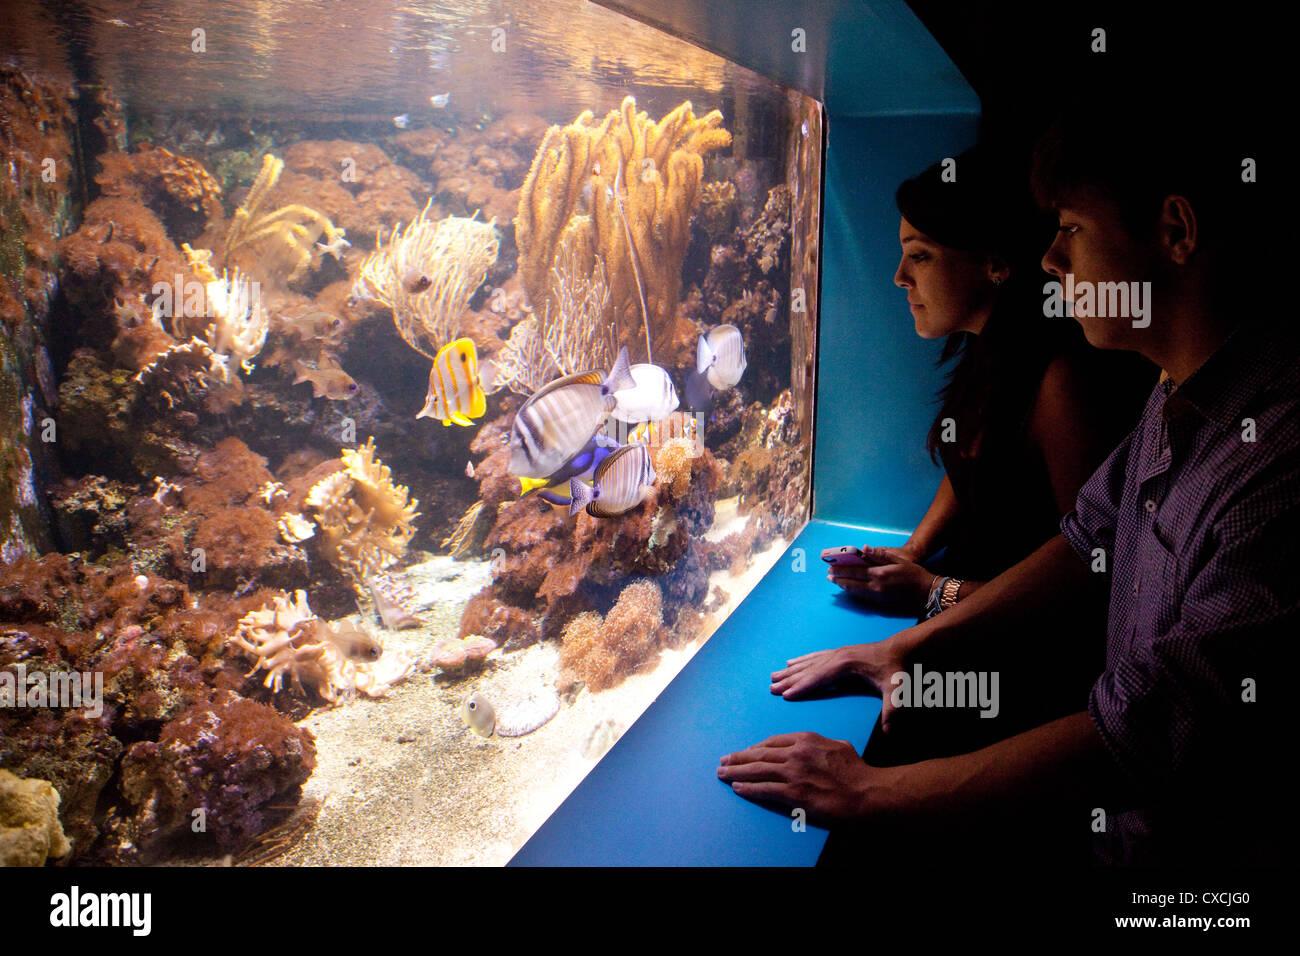 teenagers looking at fish, the Sea Life London Aquarium, London UK - Stock Image